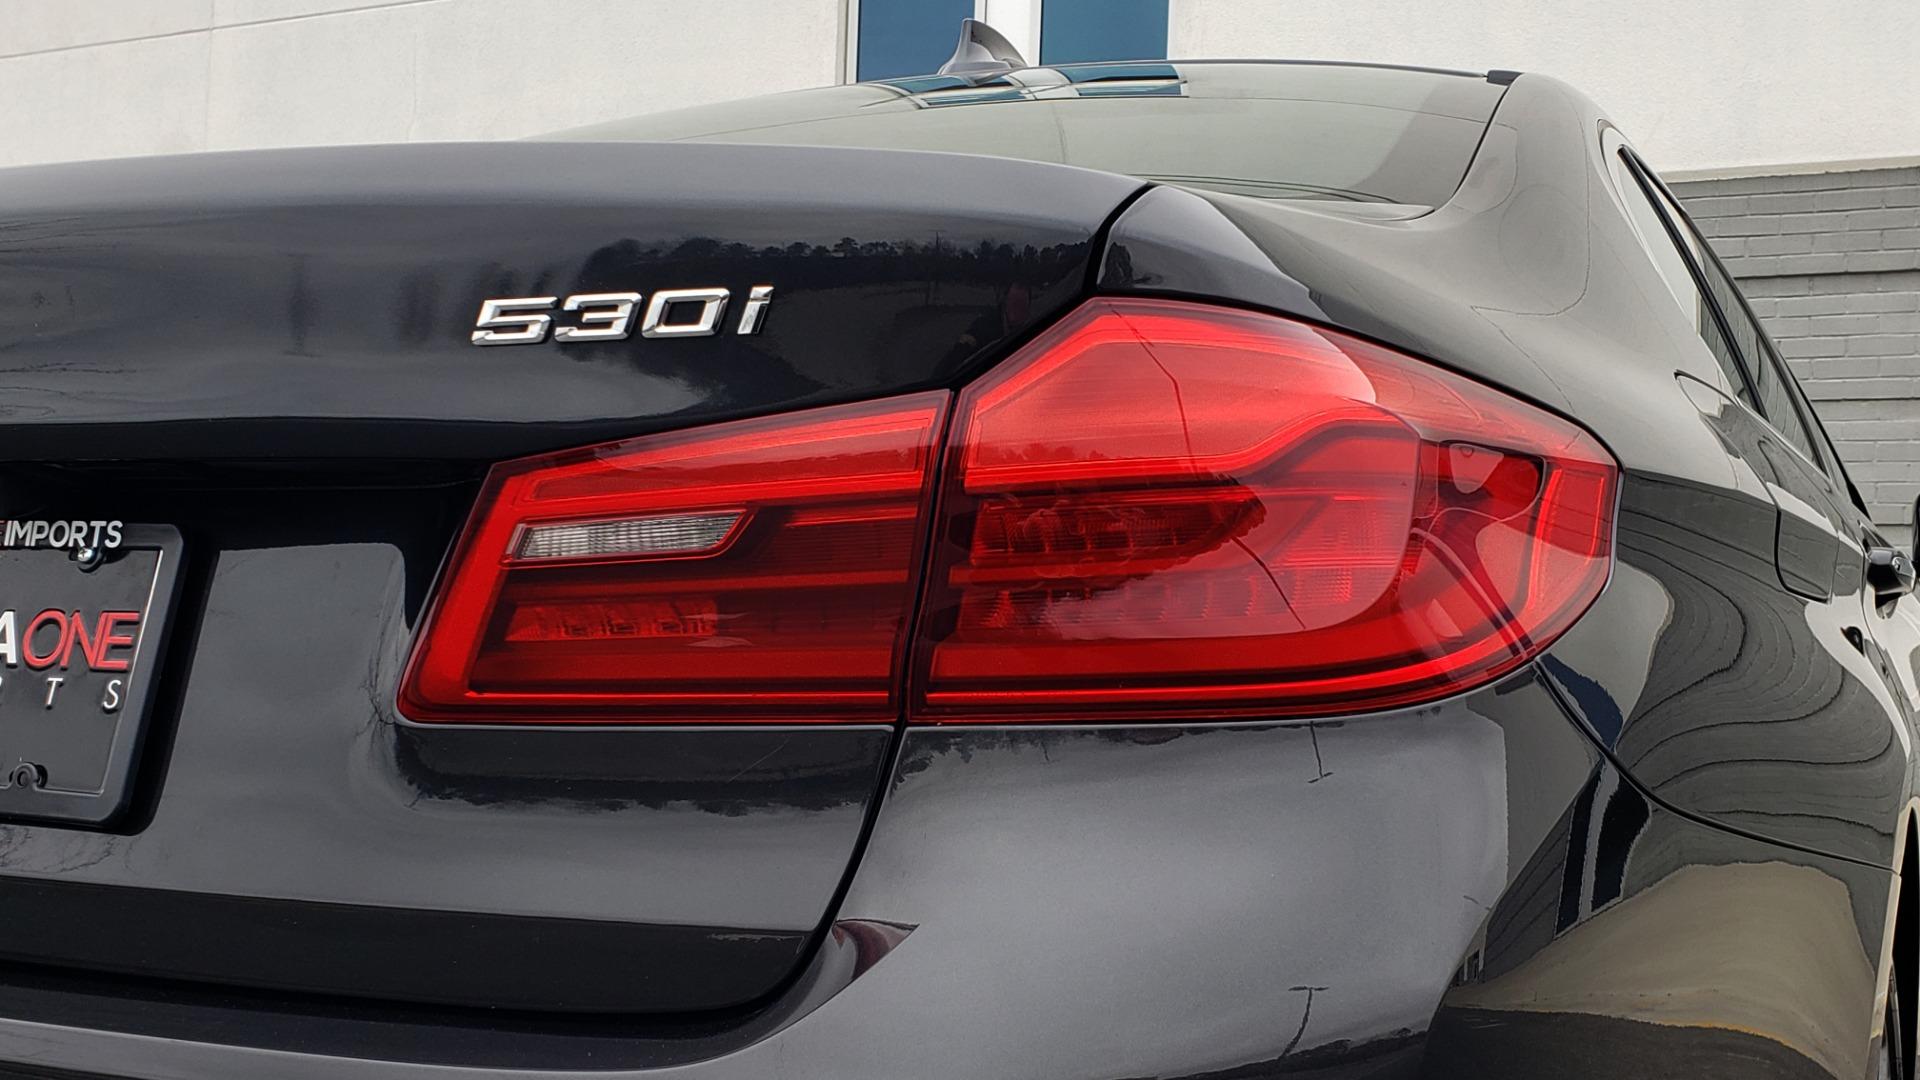 Used 2017 BMW 5 SERIES 530IXDRIVE / PREM PKG / DRVR ASST PLUS / CLD WTHR / APPLE CARPLAY for sale $30,595 at Formula Imports in Charlotte NC 28227 27